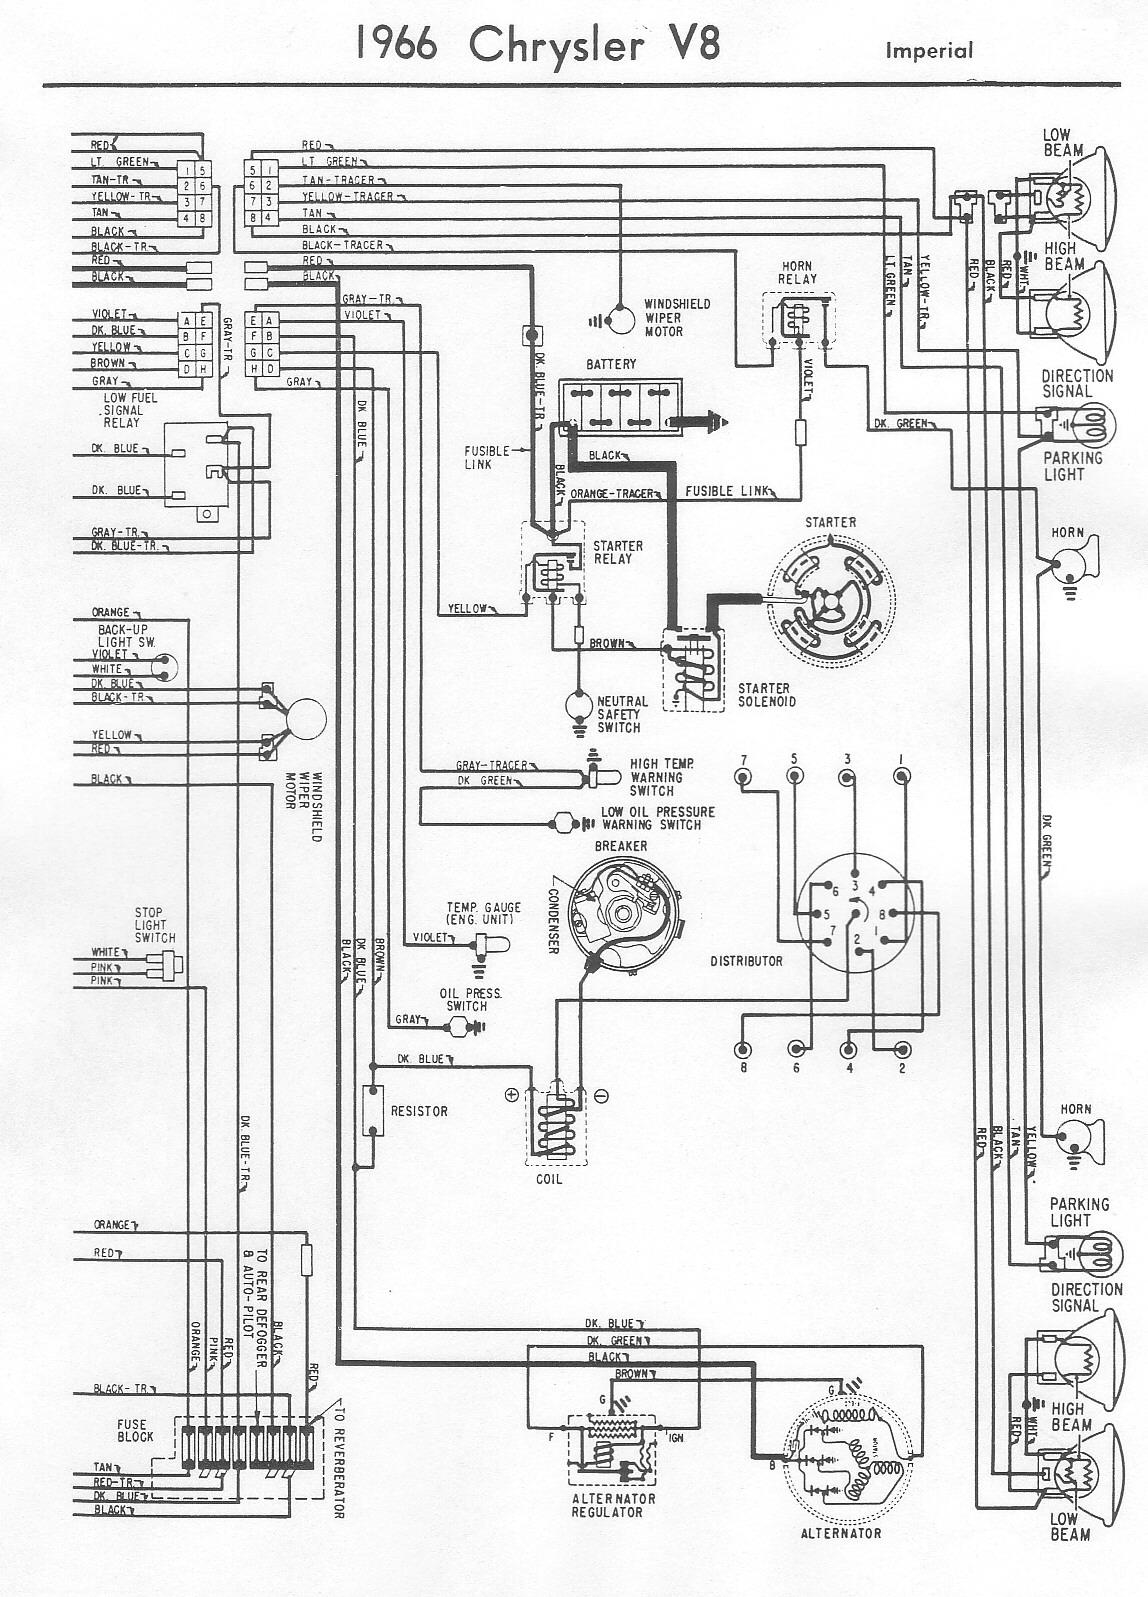 Bluebird Alternator Wiring Schematics - 2005 Hyundai Tiburon Wiring Diagram  - audi-a3.yenpancane.jeanjaures37.frWiring Diagram Resource